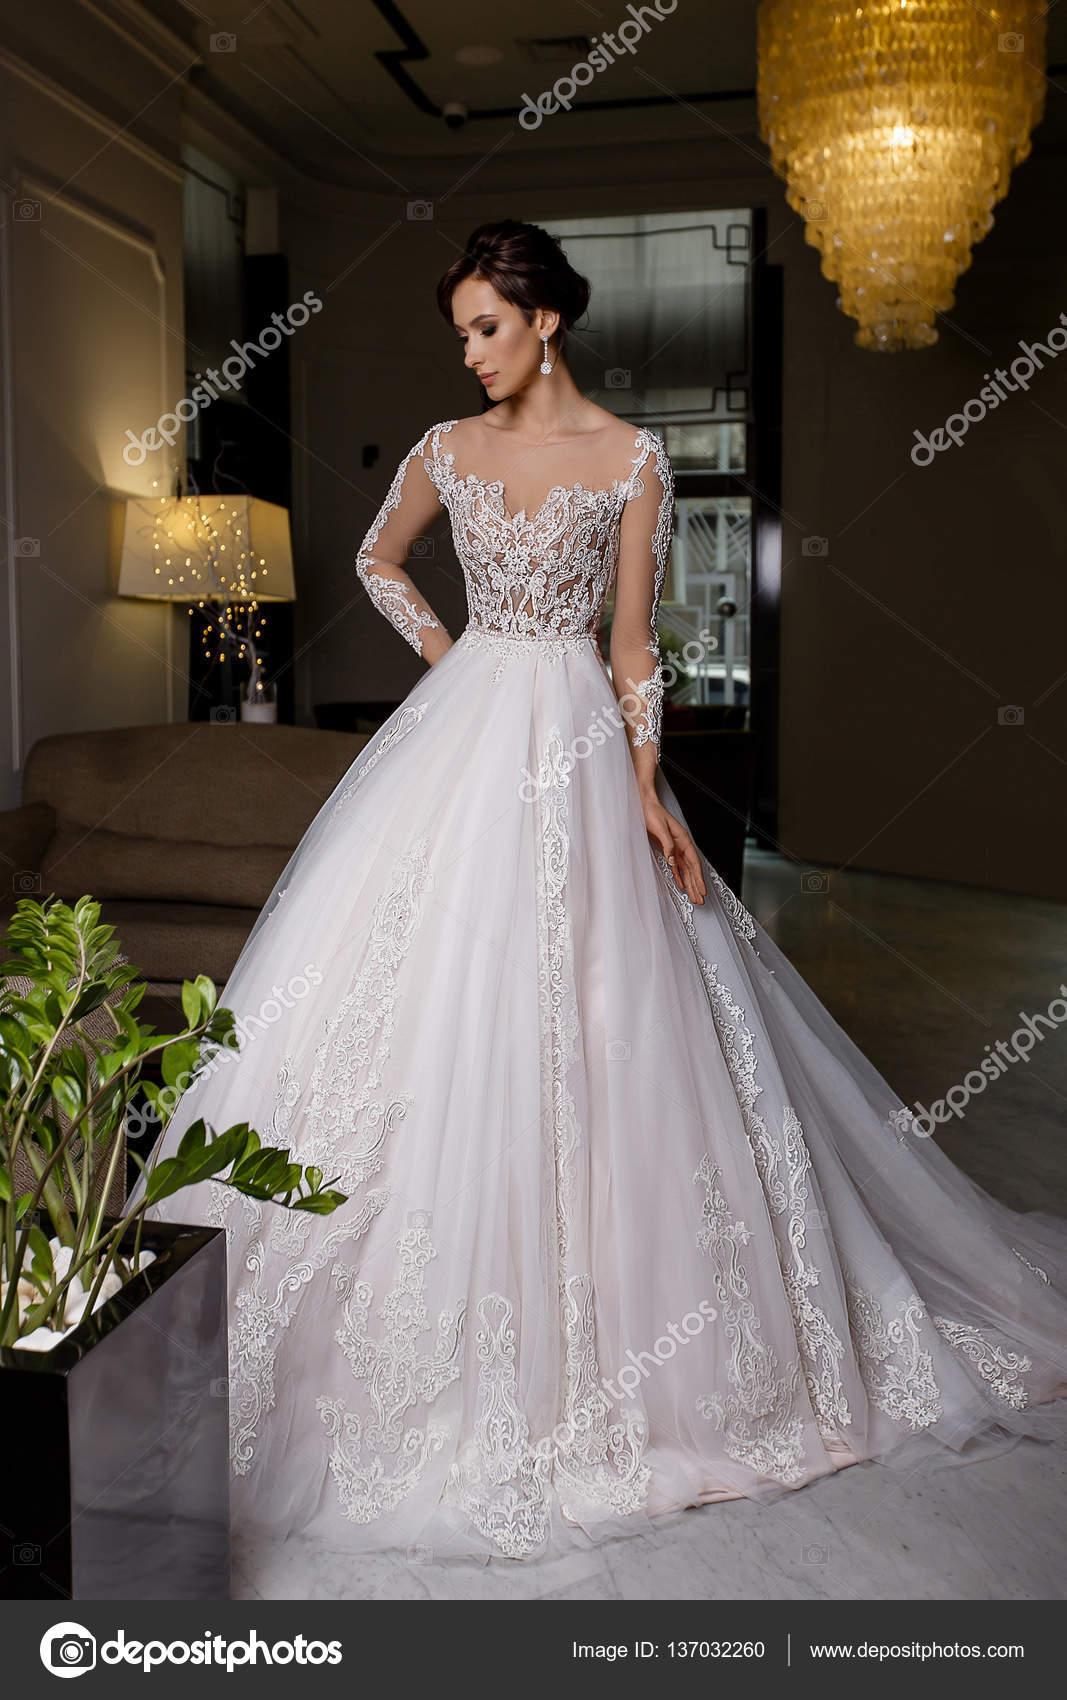 ee74e7f271b6 Σοβαρή νεαρή μελαχρινή μοντέλο θηλυκό πόζες στο μακρύ νυφικό φόρεμα με  δαντέλα στο πανέμορφο φόντο —